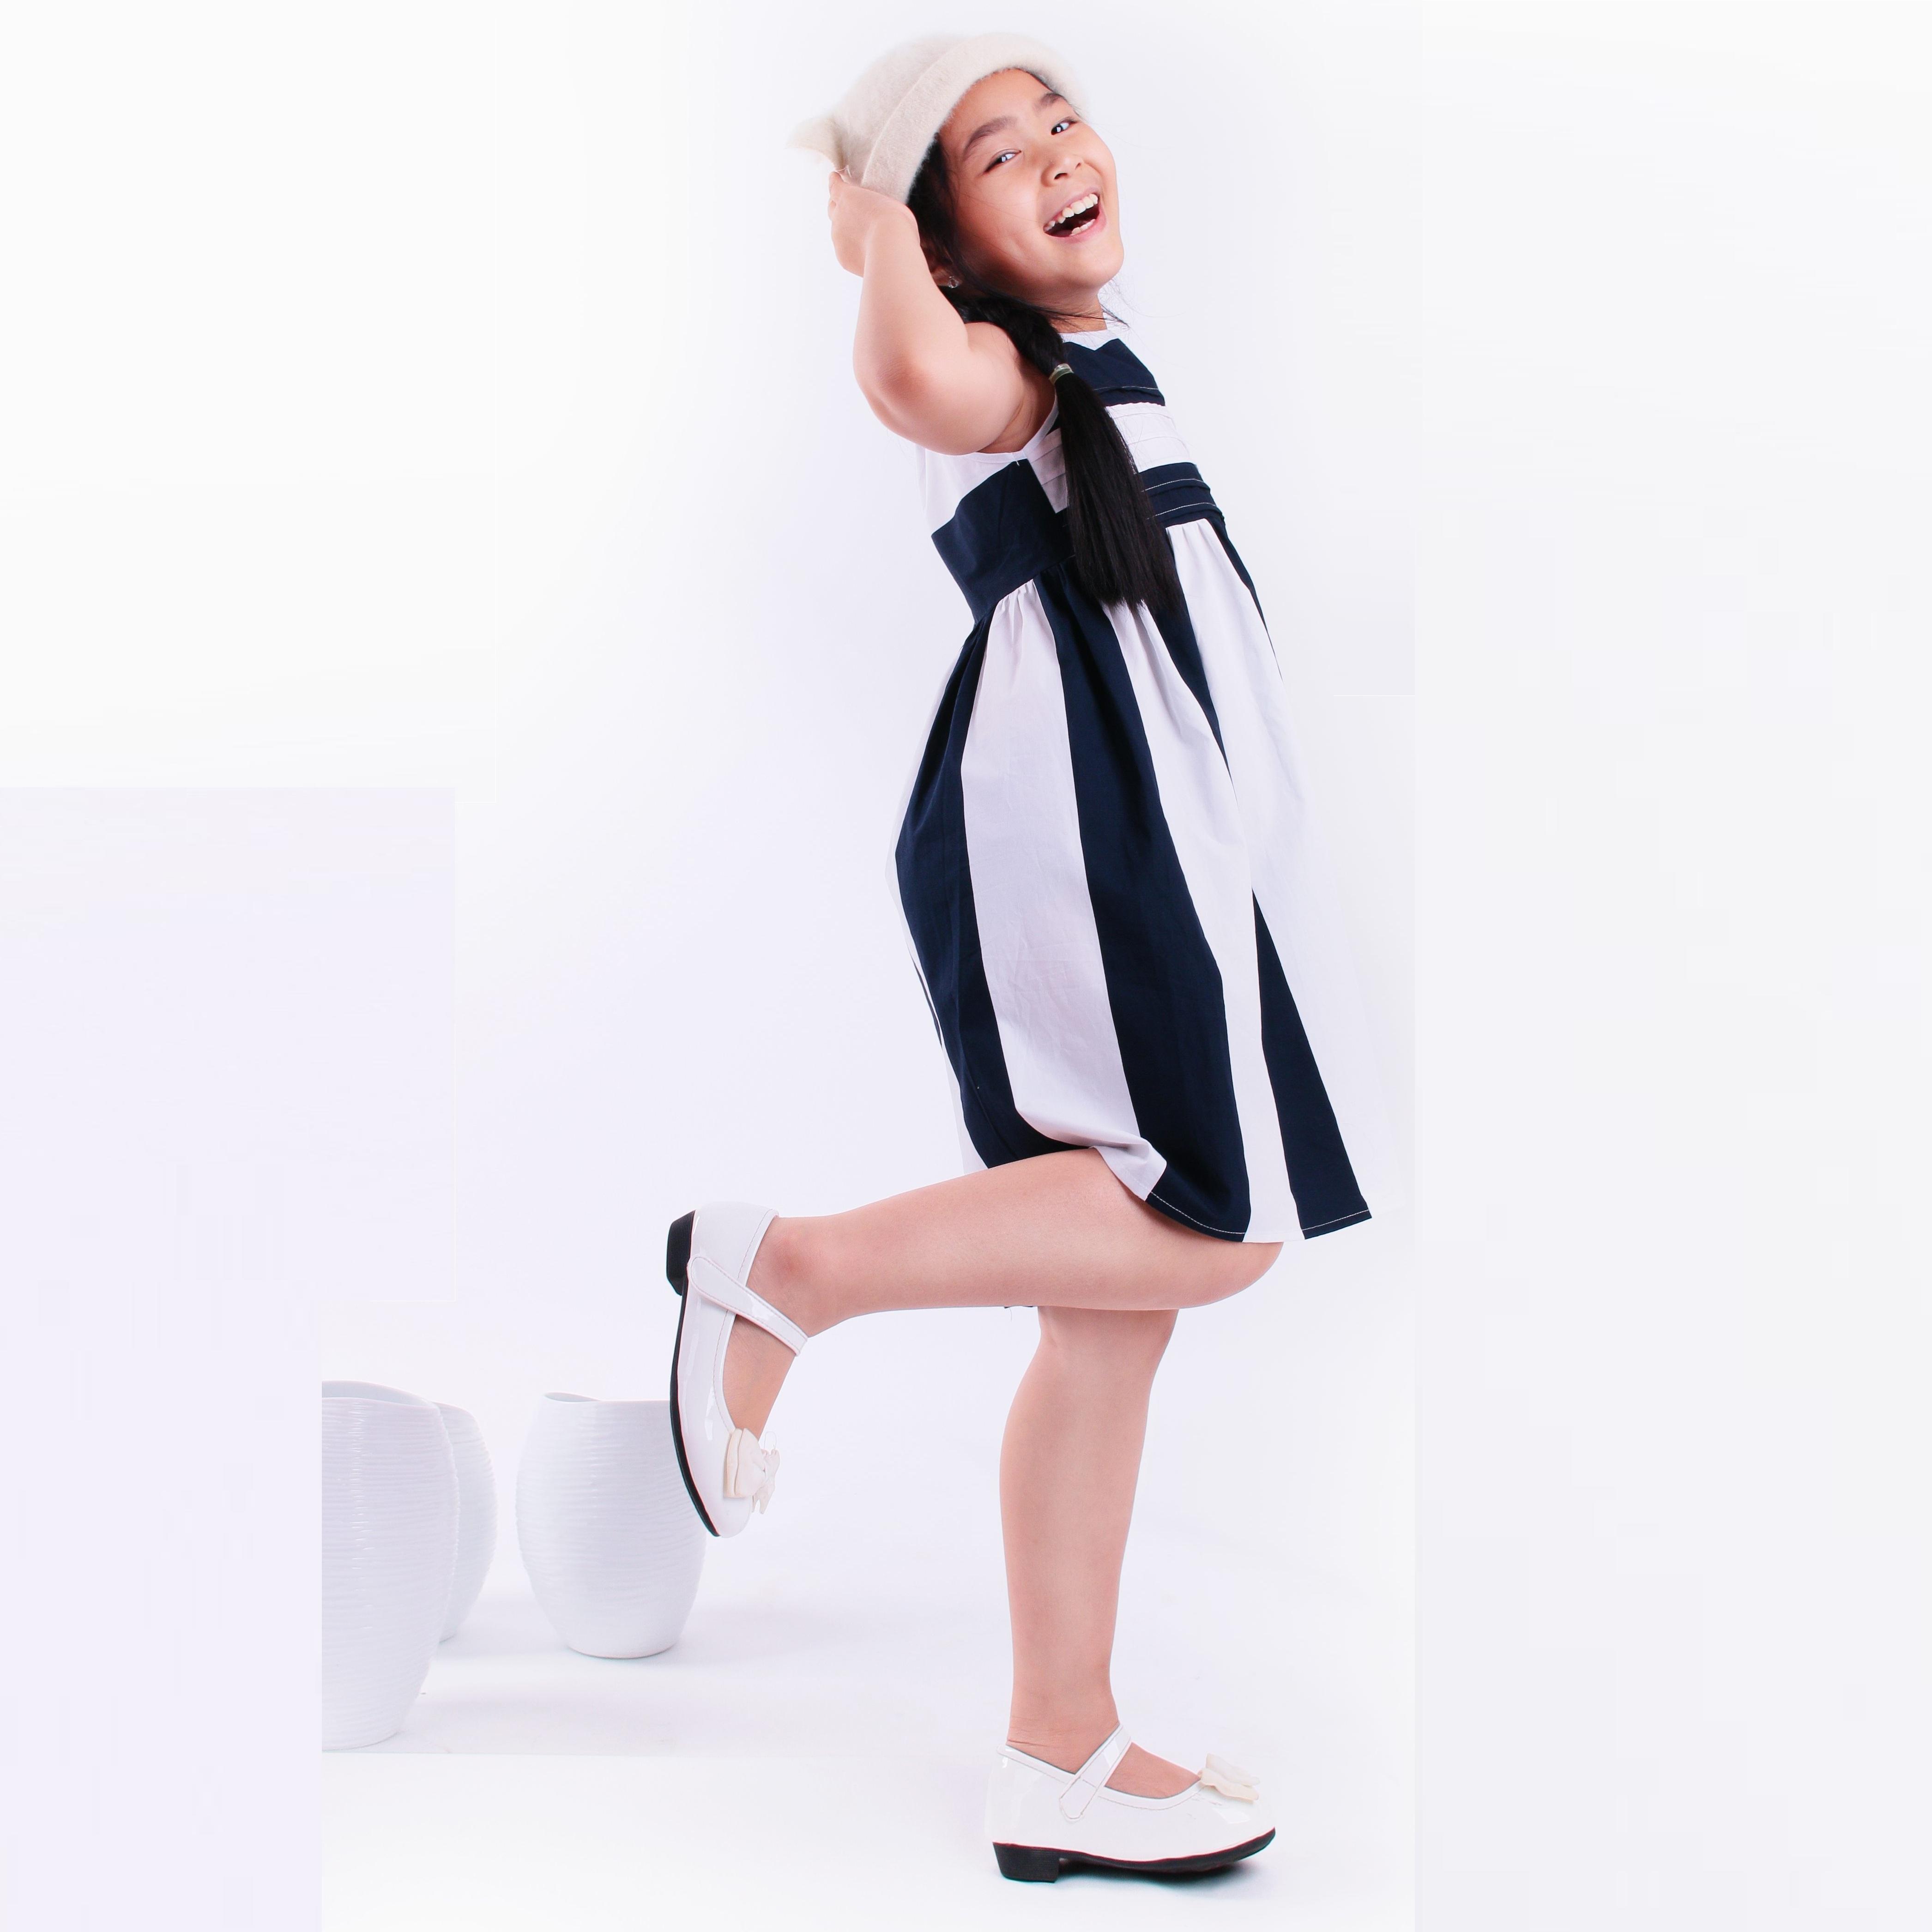 UKID64 - Đầm bé gái